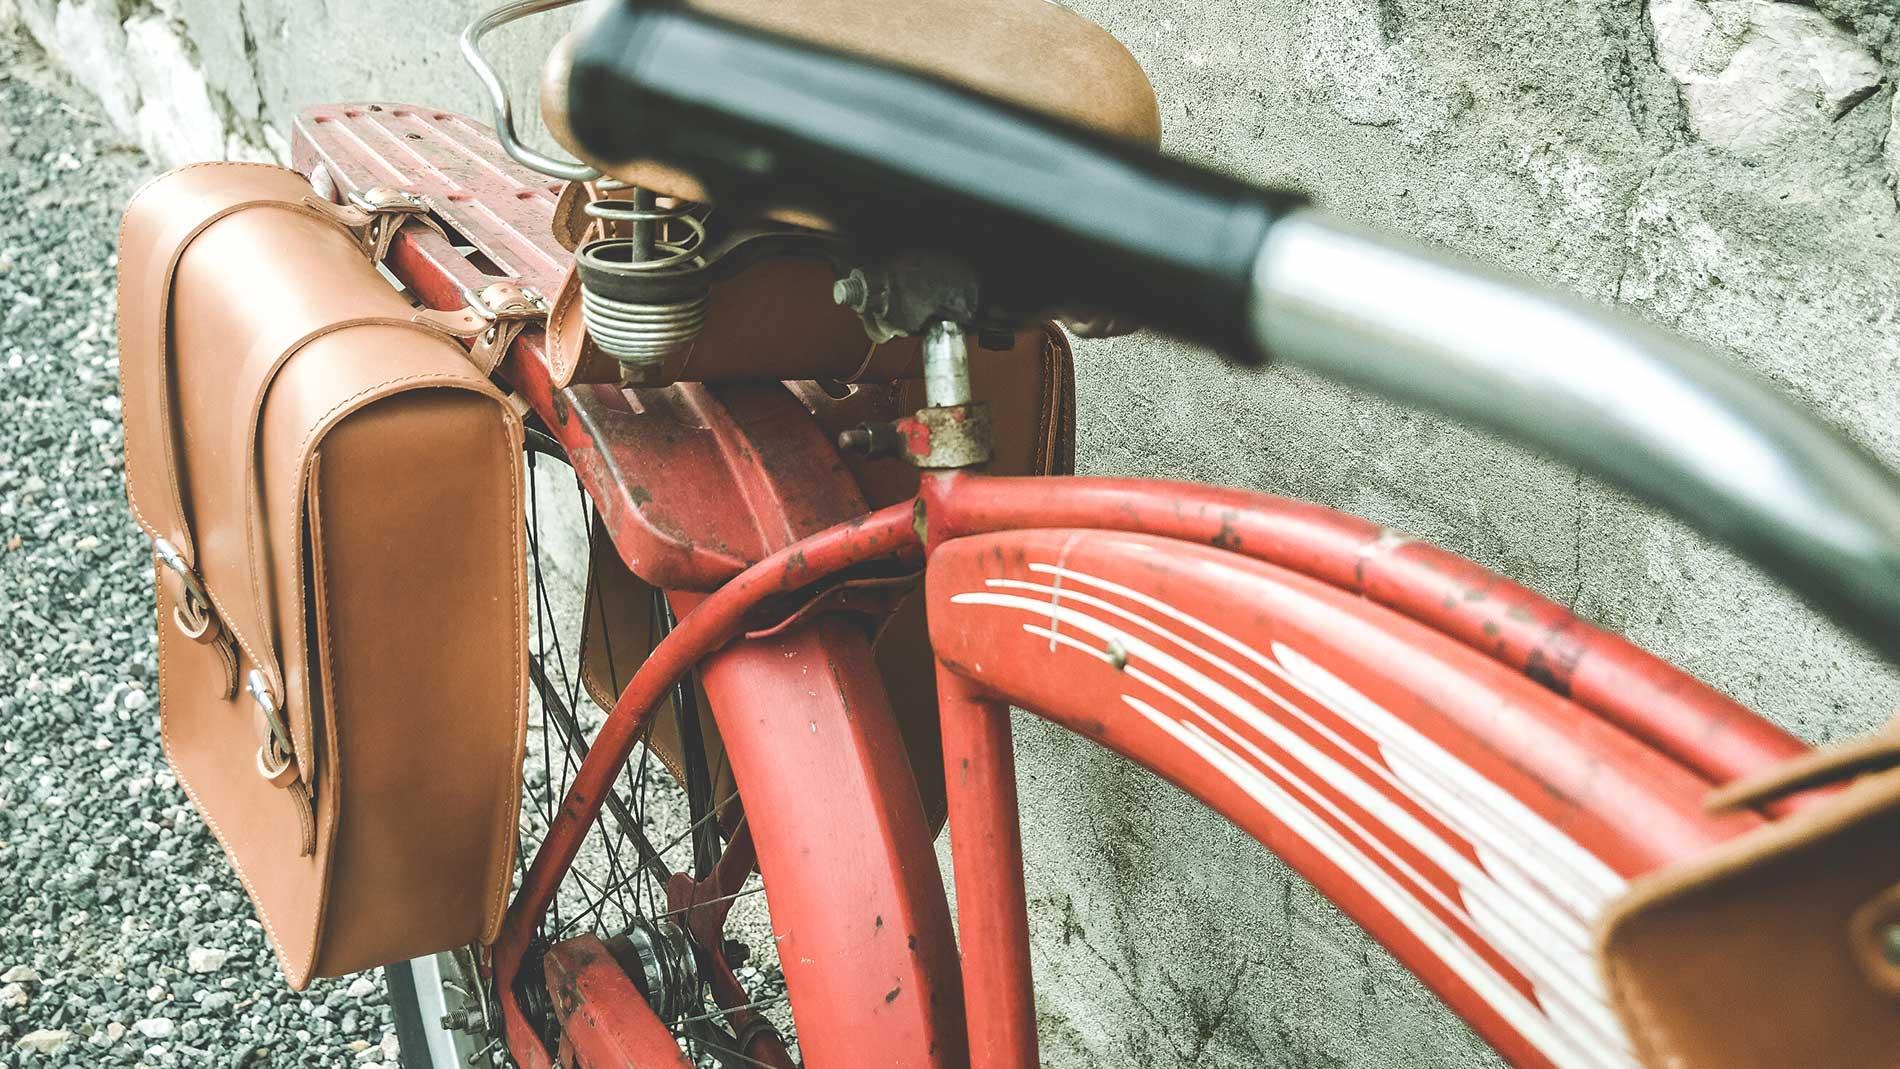 borse bici laterali in pelle impermeabili